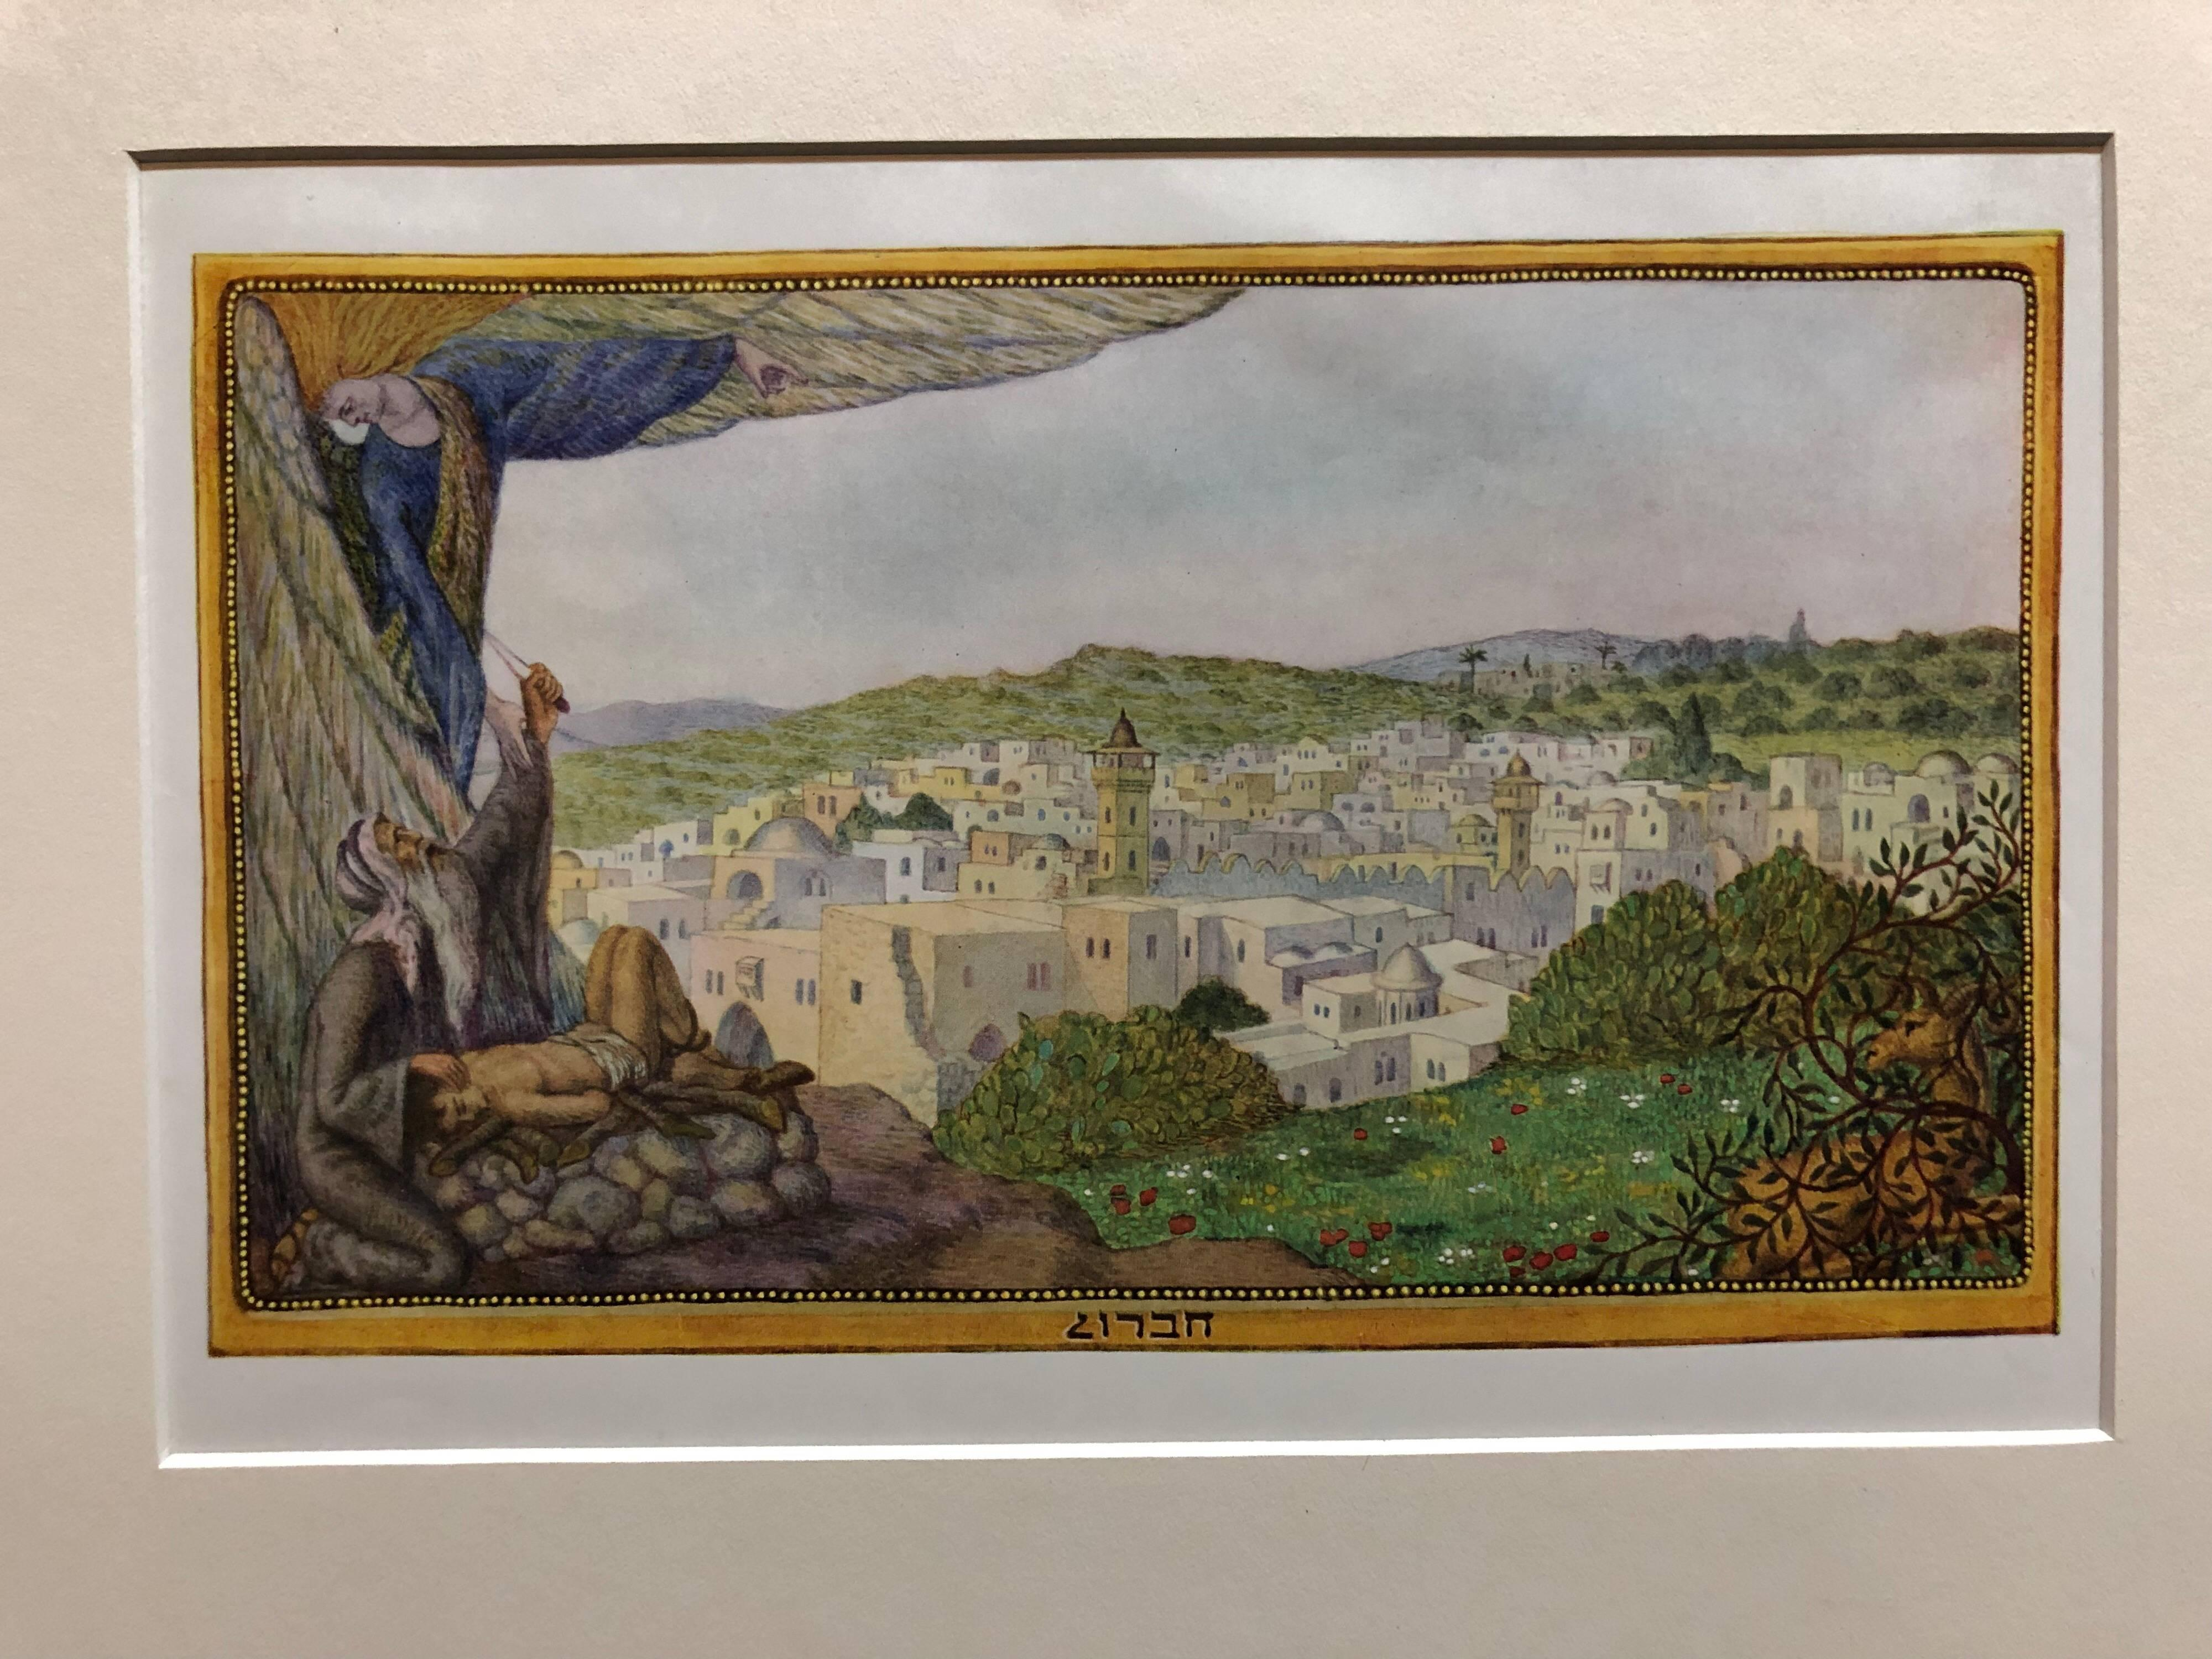 Rare Judaica Chevron Bezalel Zeev Raban Chromolithograph (made in Palestine)